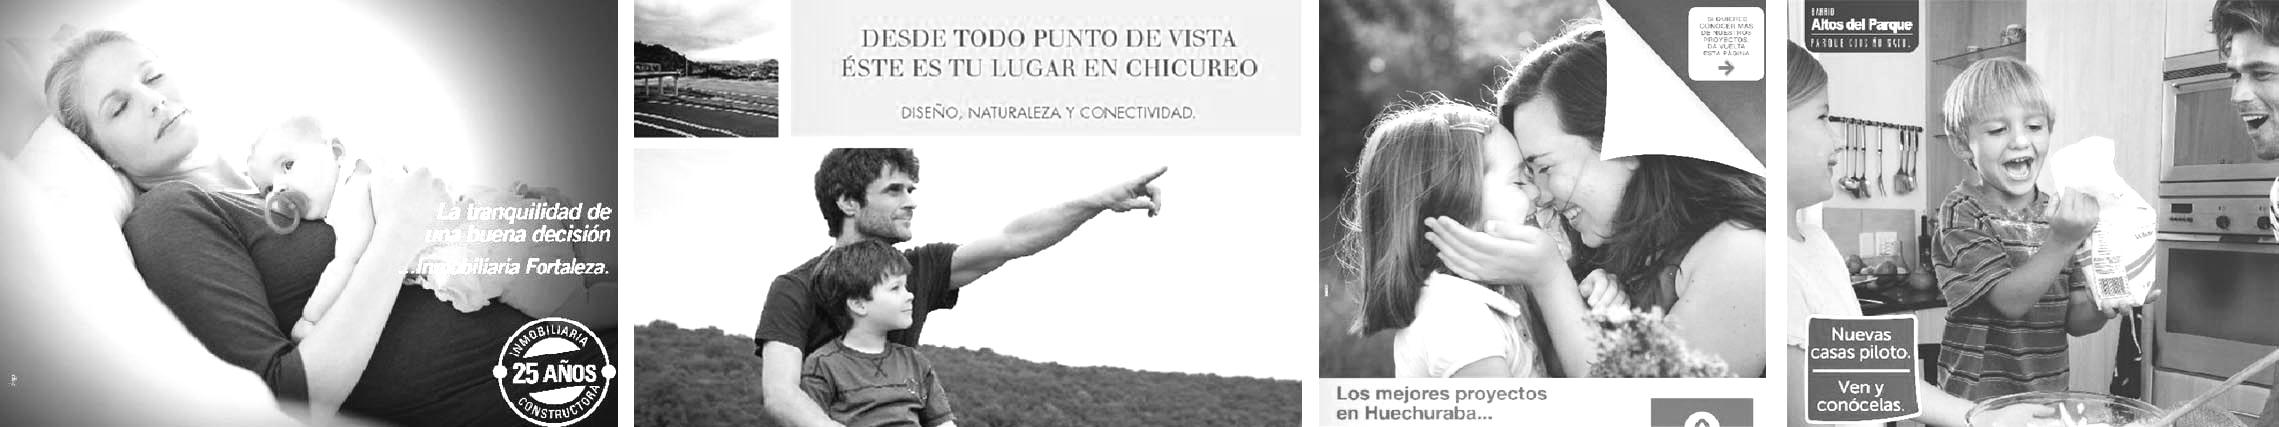 Ruiz-Tagle_López Figura 2 copie.jpg